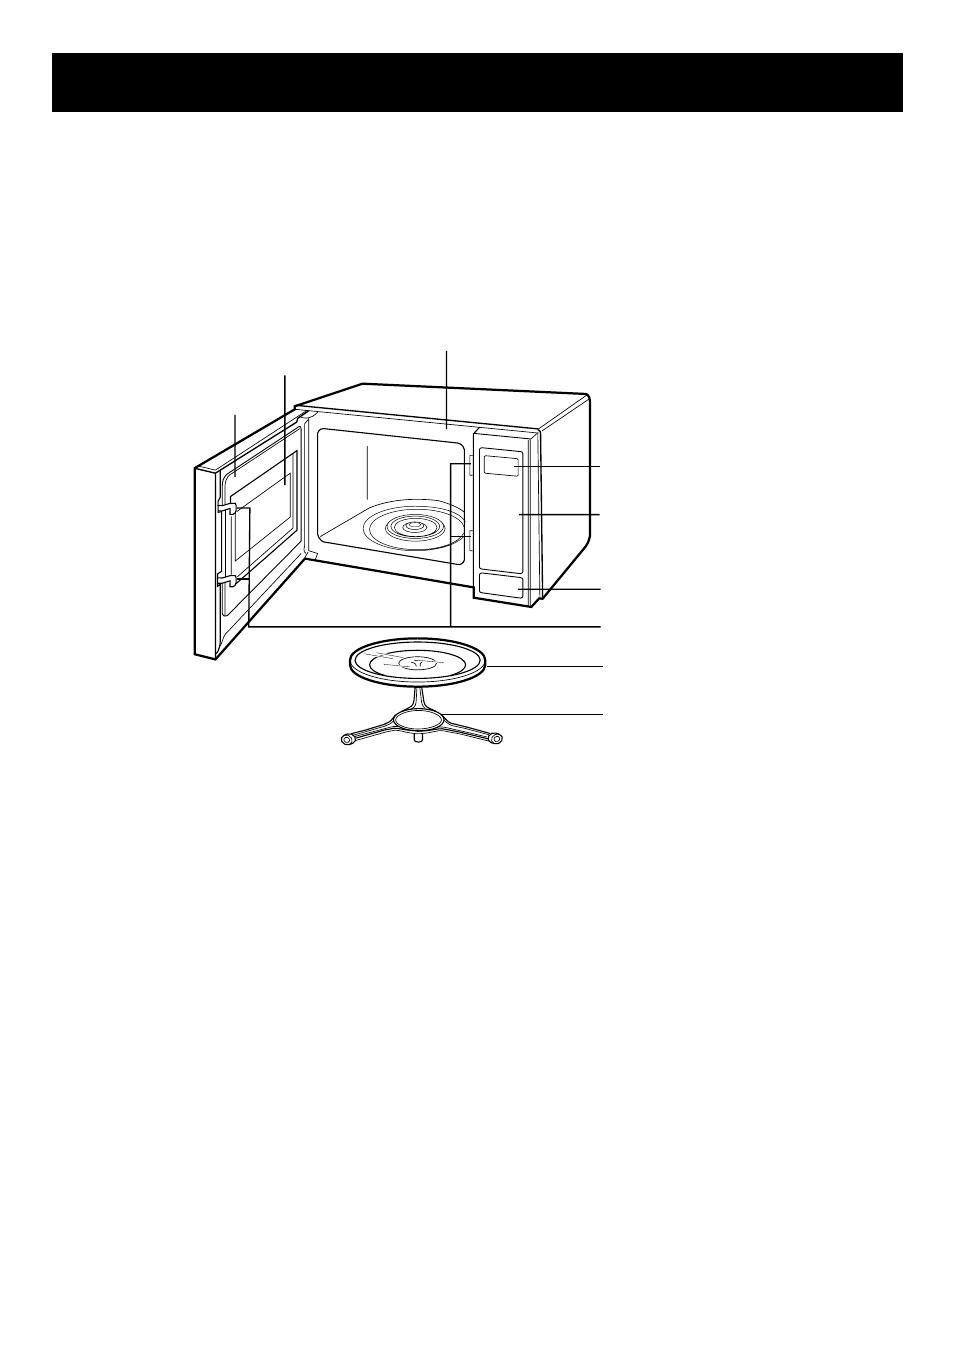 lg microwave oven parts bestmicrowave. Black Bedroom Furniture Sets. Home Design Ideas